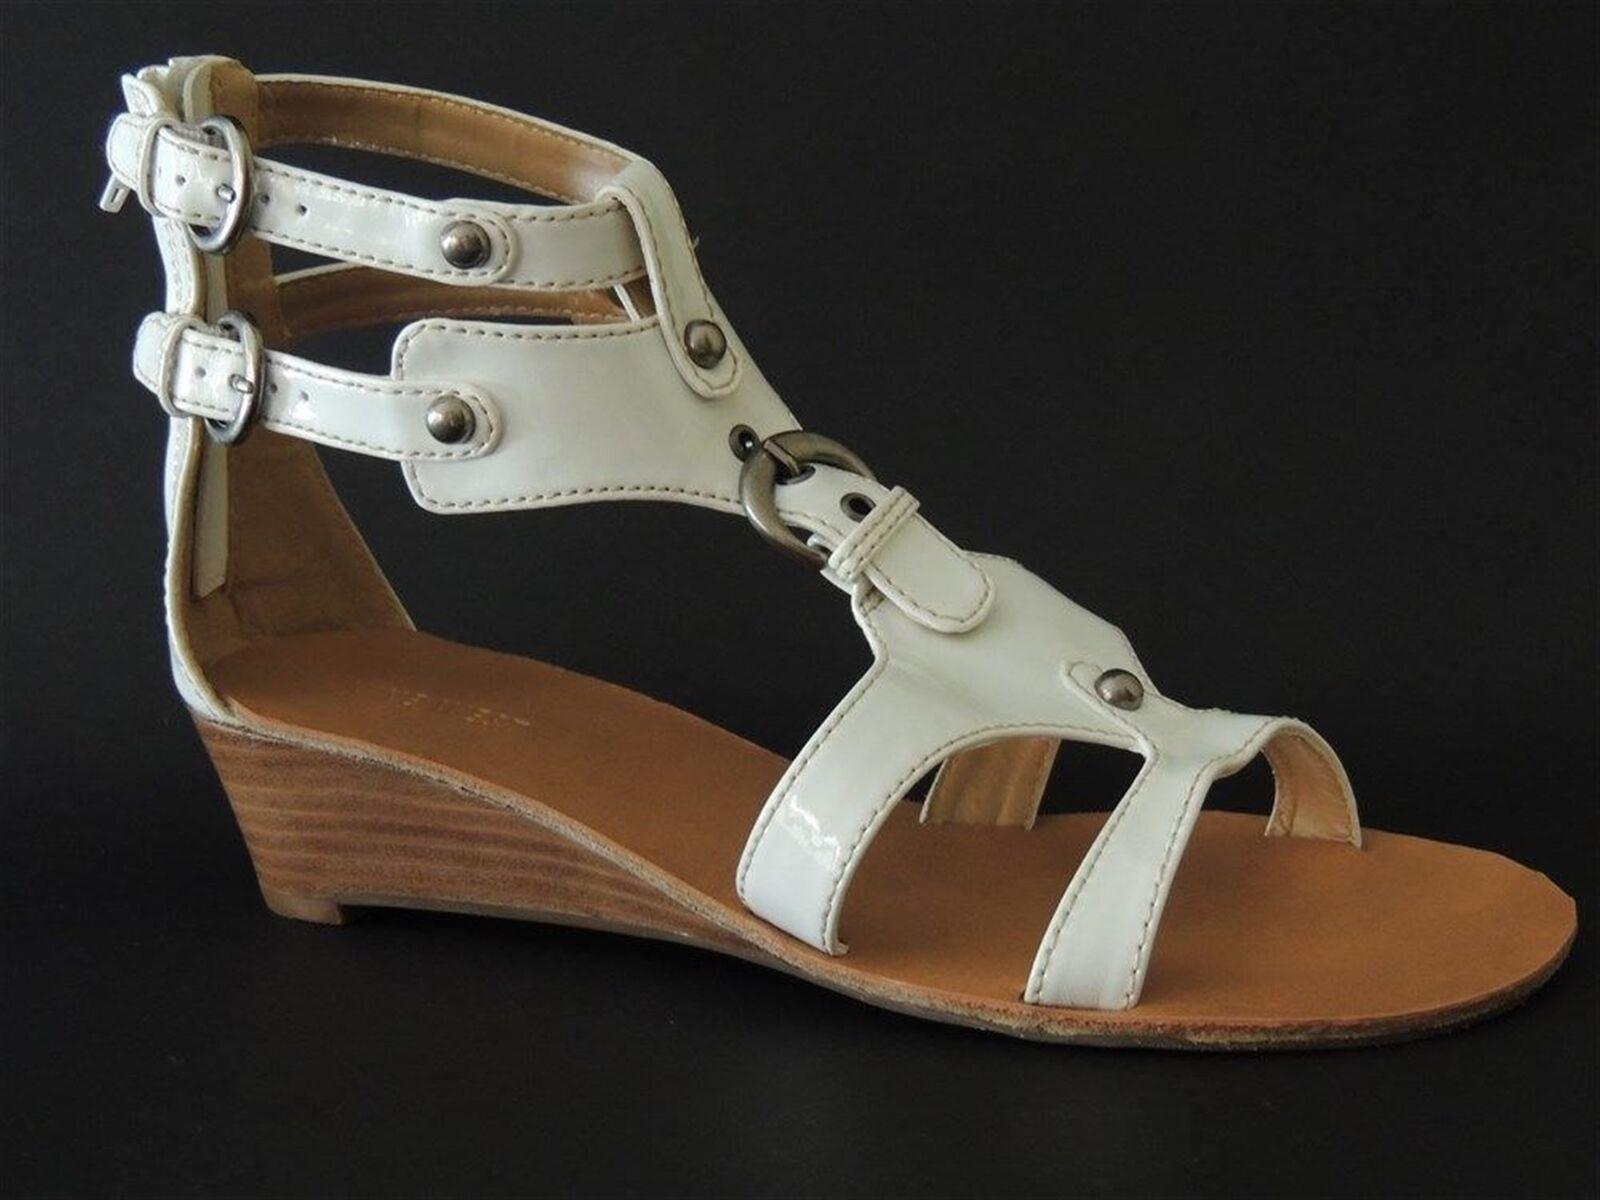 Nine West Women's Rightway-L1 Wedge Sandals White Size 8 M